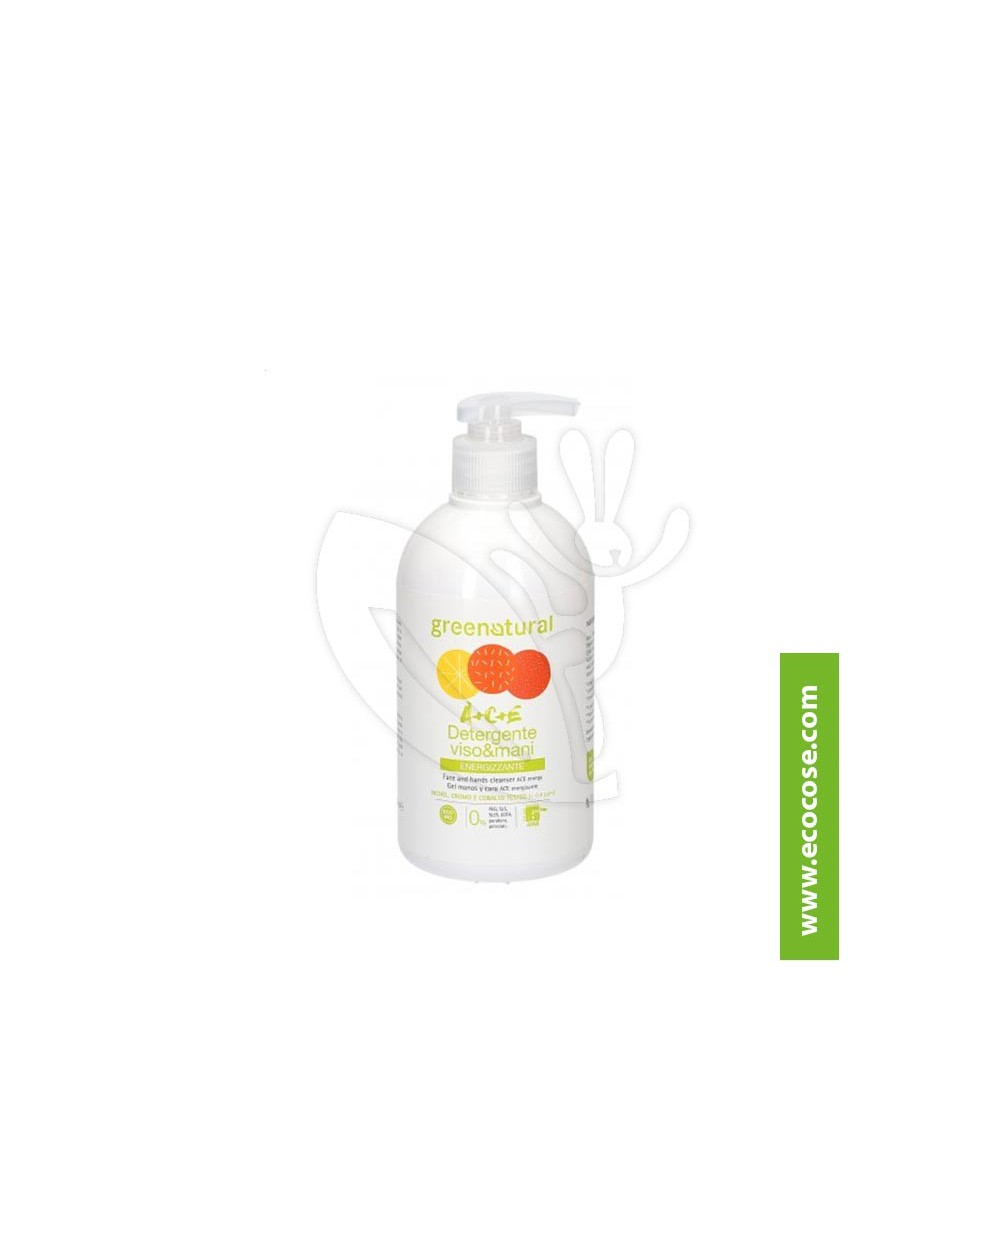 Greenatural - A+C+E - Detergente viso e mani RICARICA